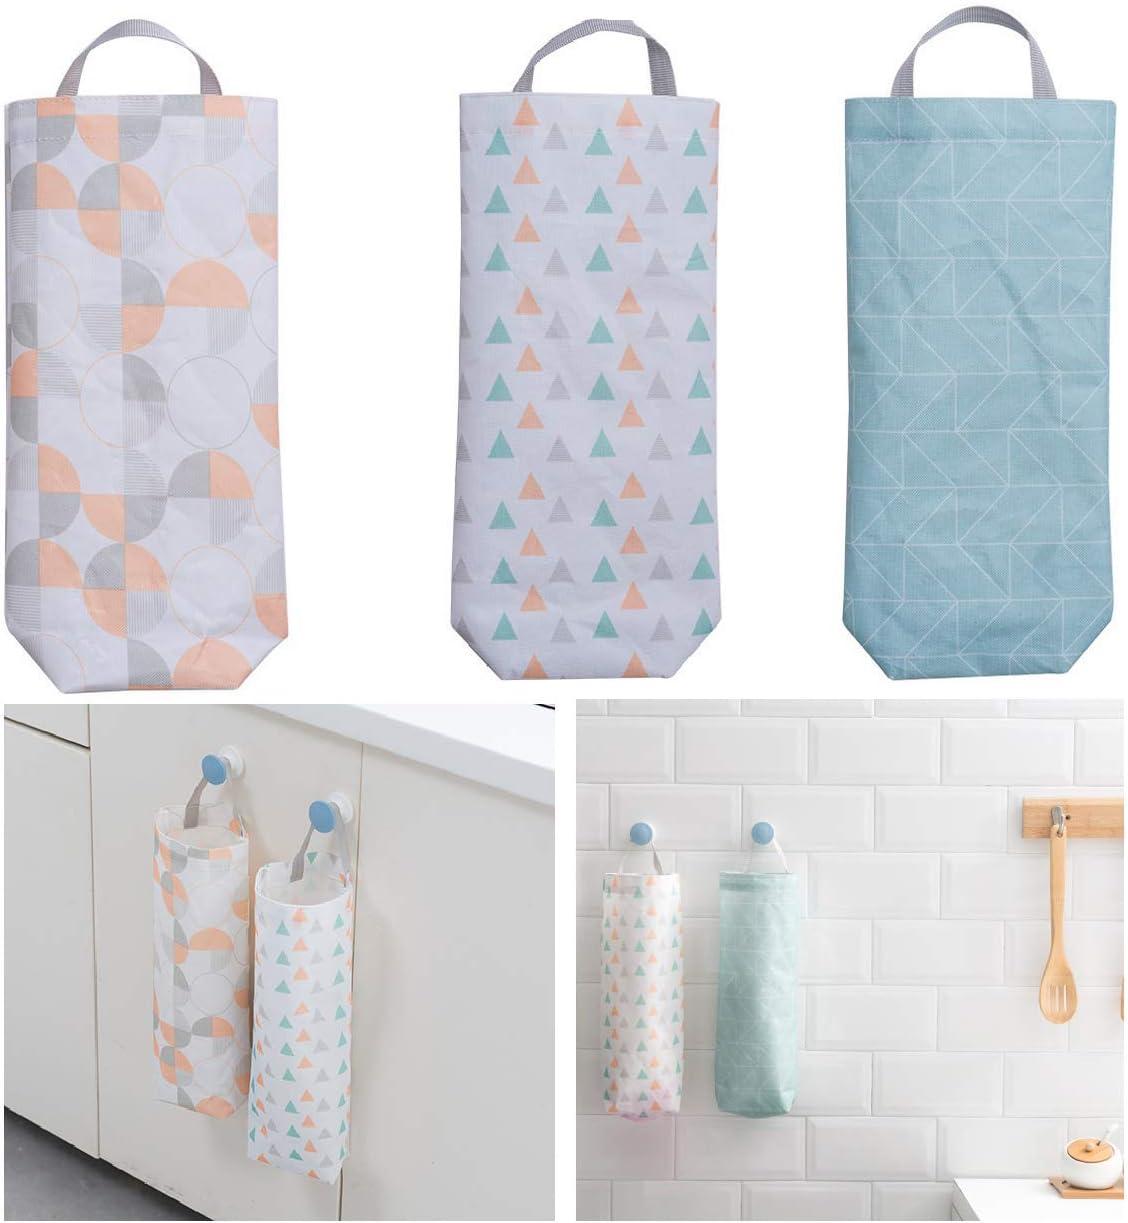 Pantry Organization Floral Bird Plastic Bag Storage Mothers Day Gift Hanging Bag Holder Closet Organizer Gray Bird Print Gray Kitchen